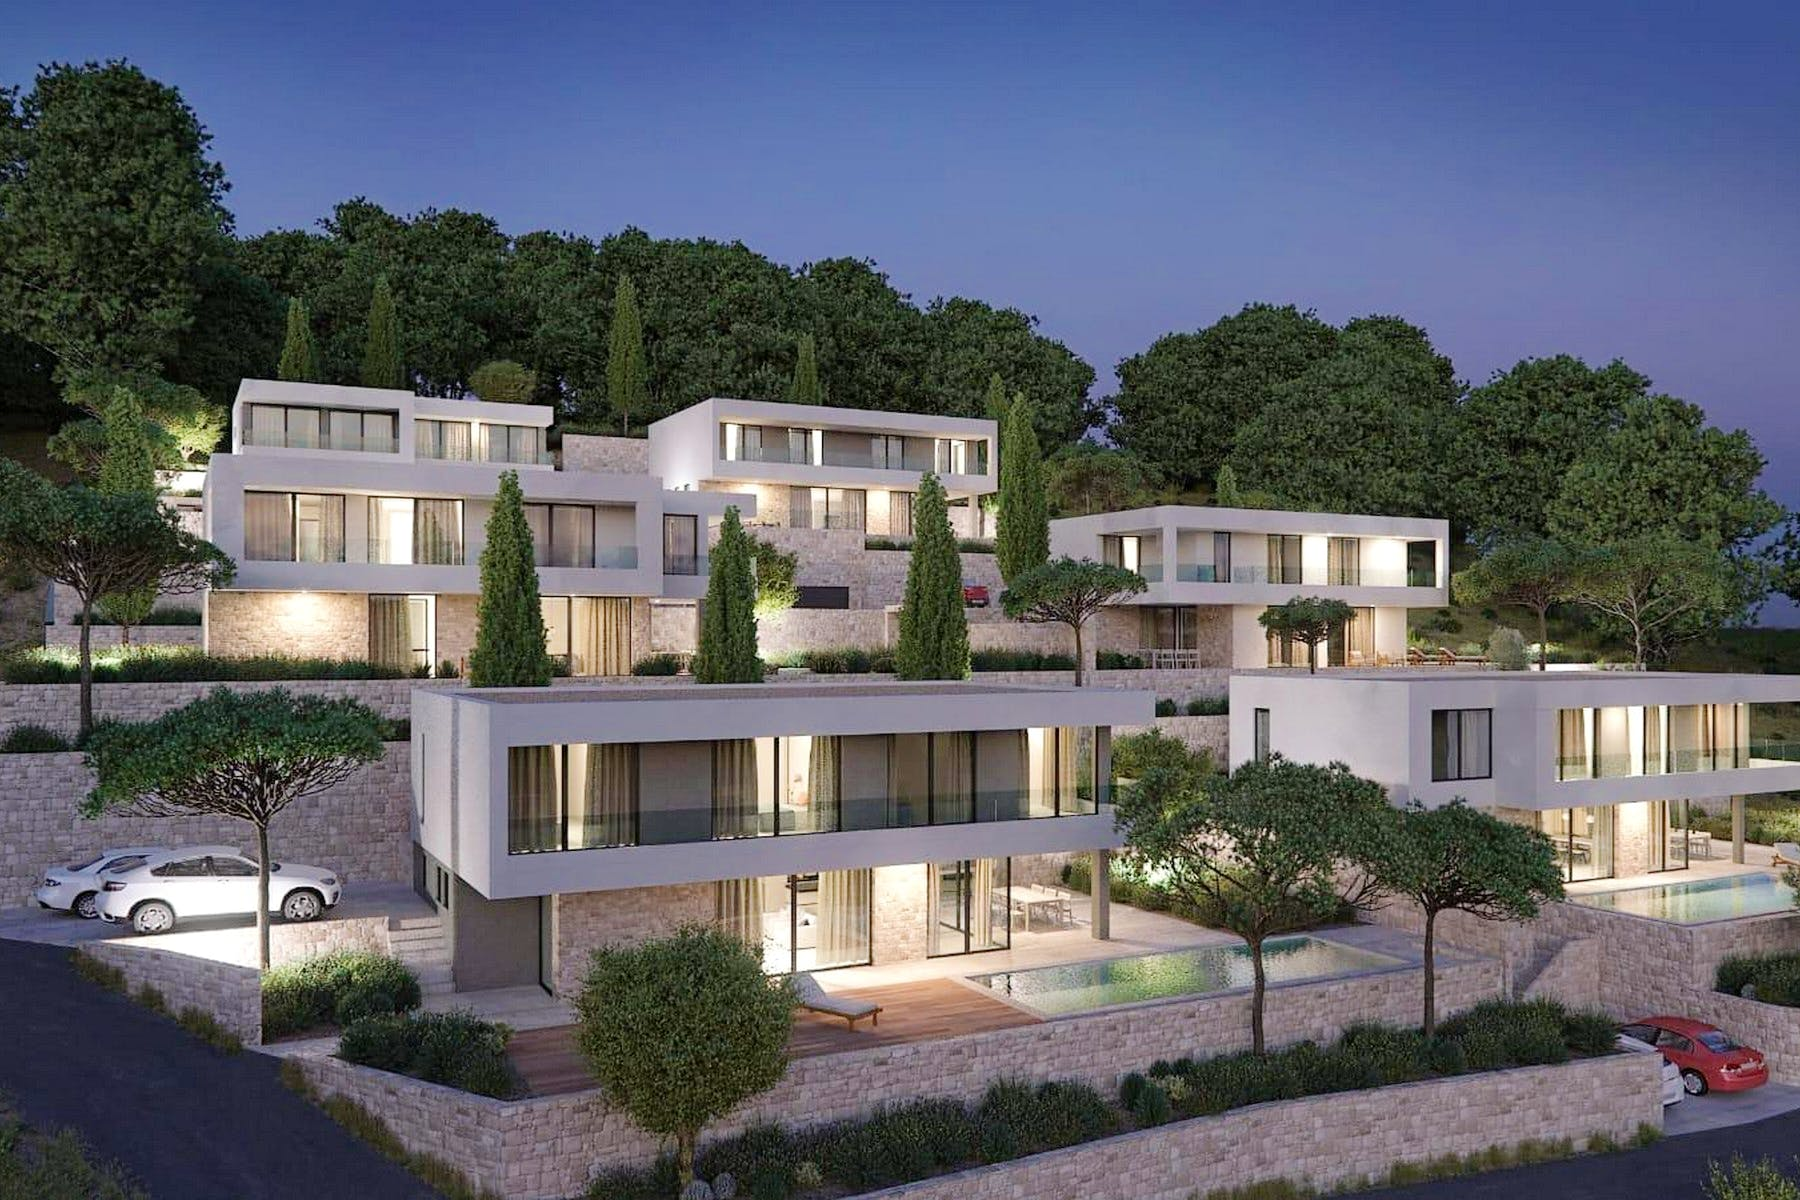 3 D of the villas